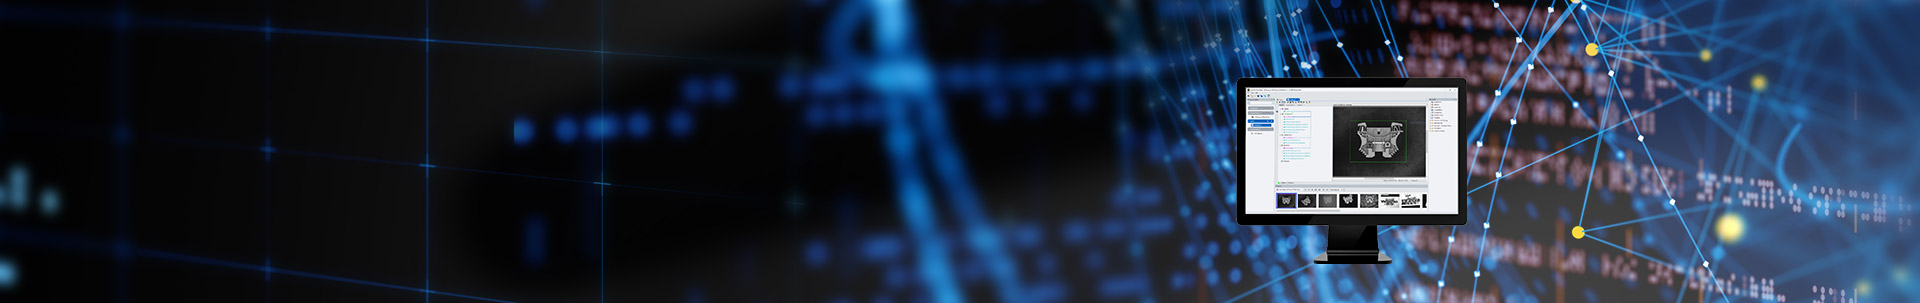 VisionPro PC-Based Vision Software